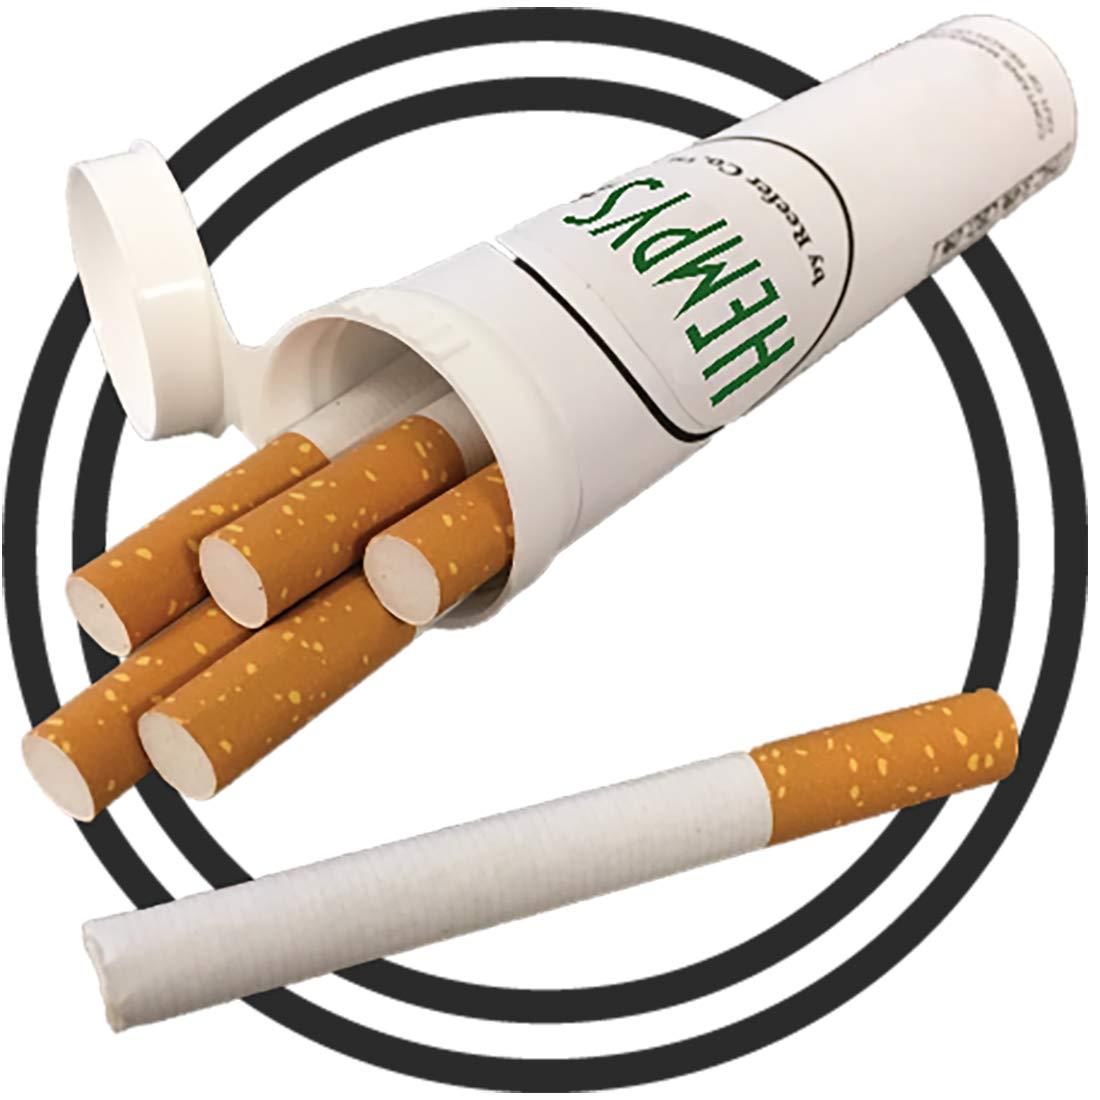 Premium Tobacco-Free Hempettes (15 Total Fresh Prerolled Herbal Smokes)